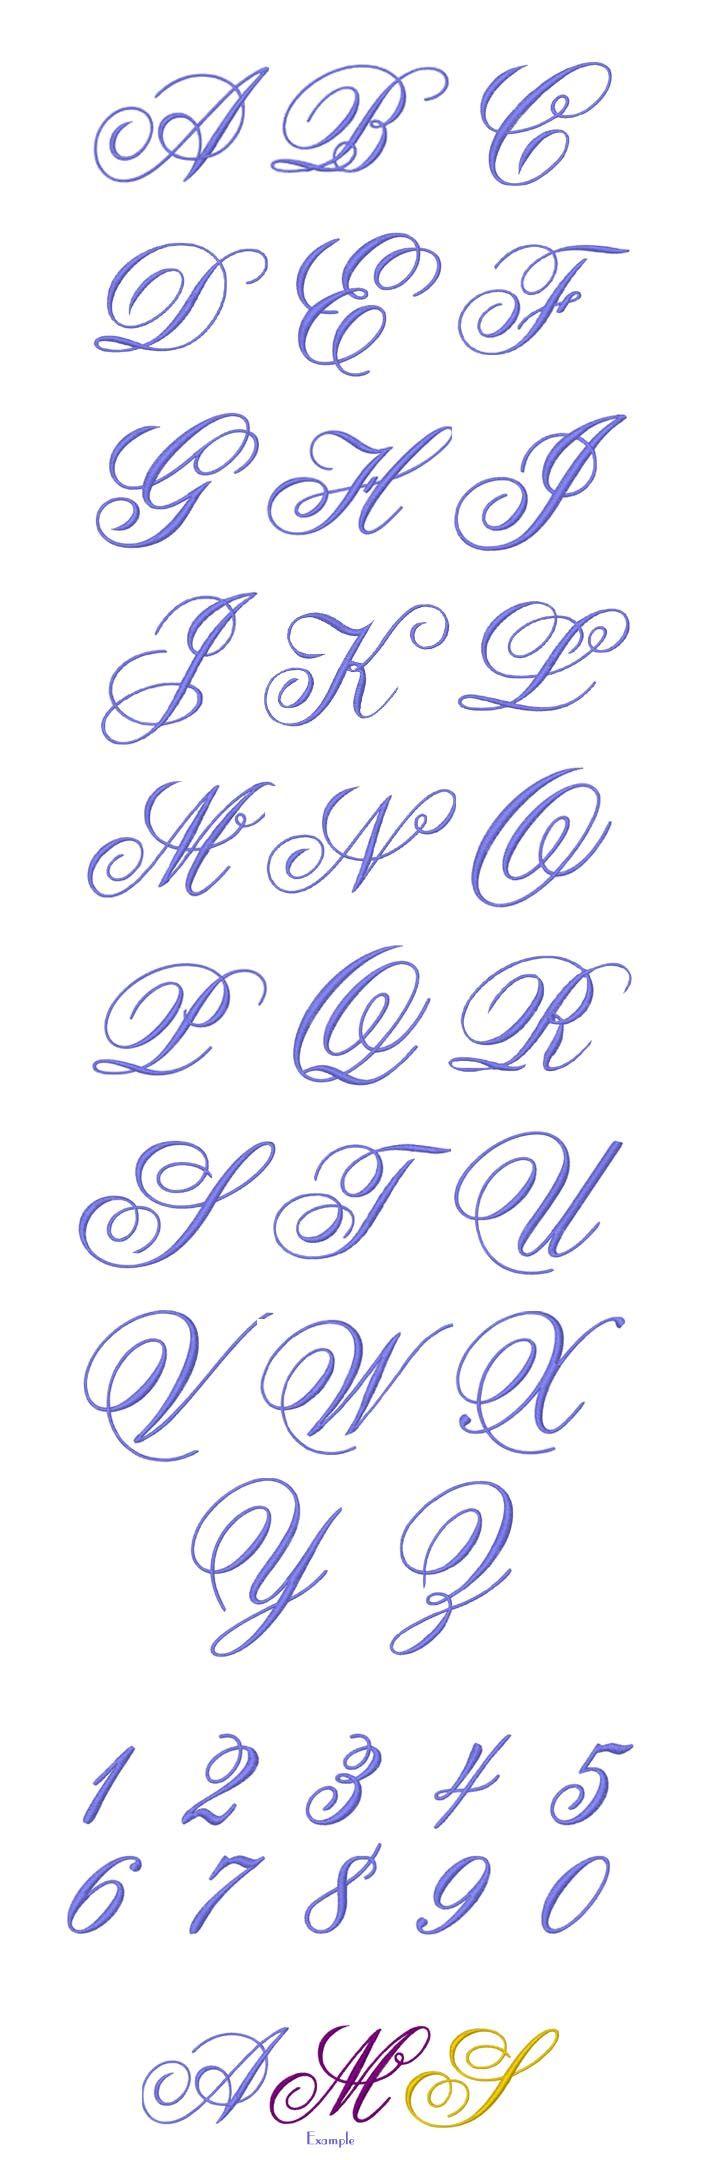 Letras Deco Lunlunta Pinterest Embroidery Designs Free